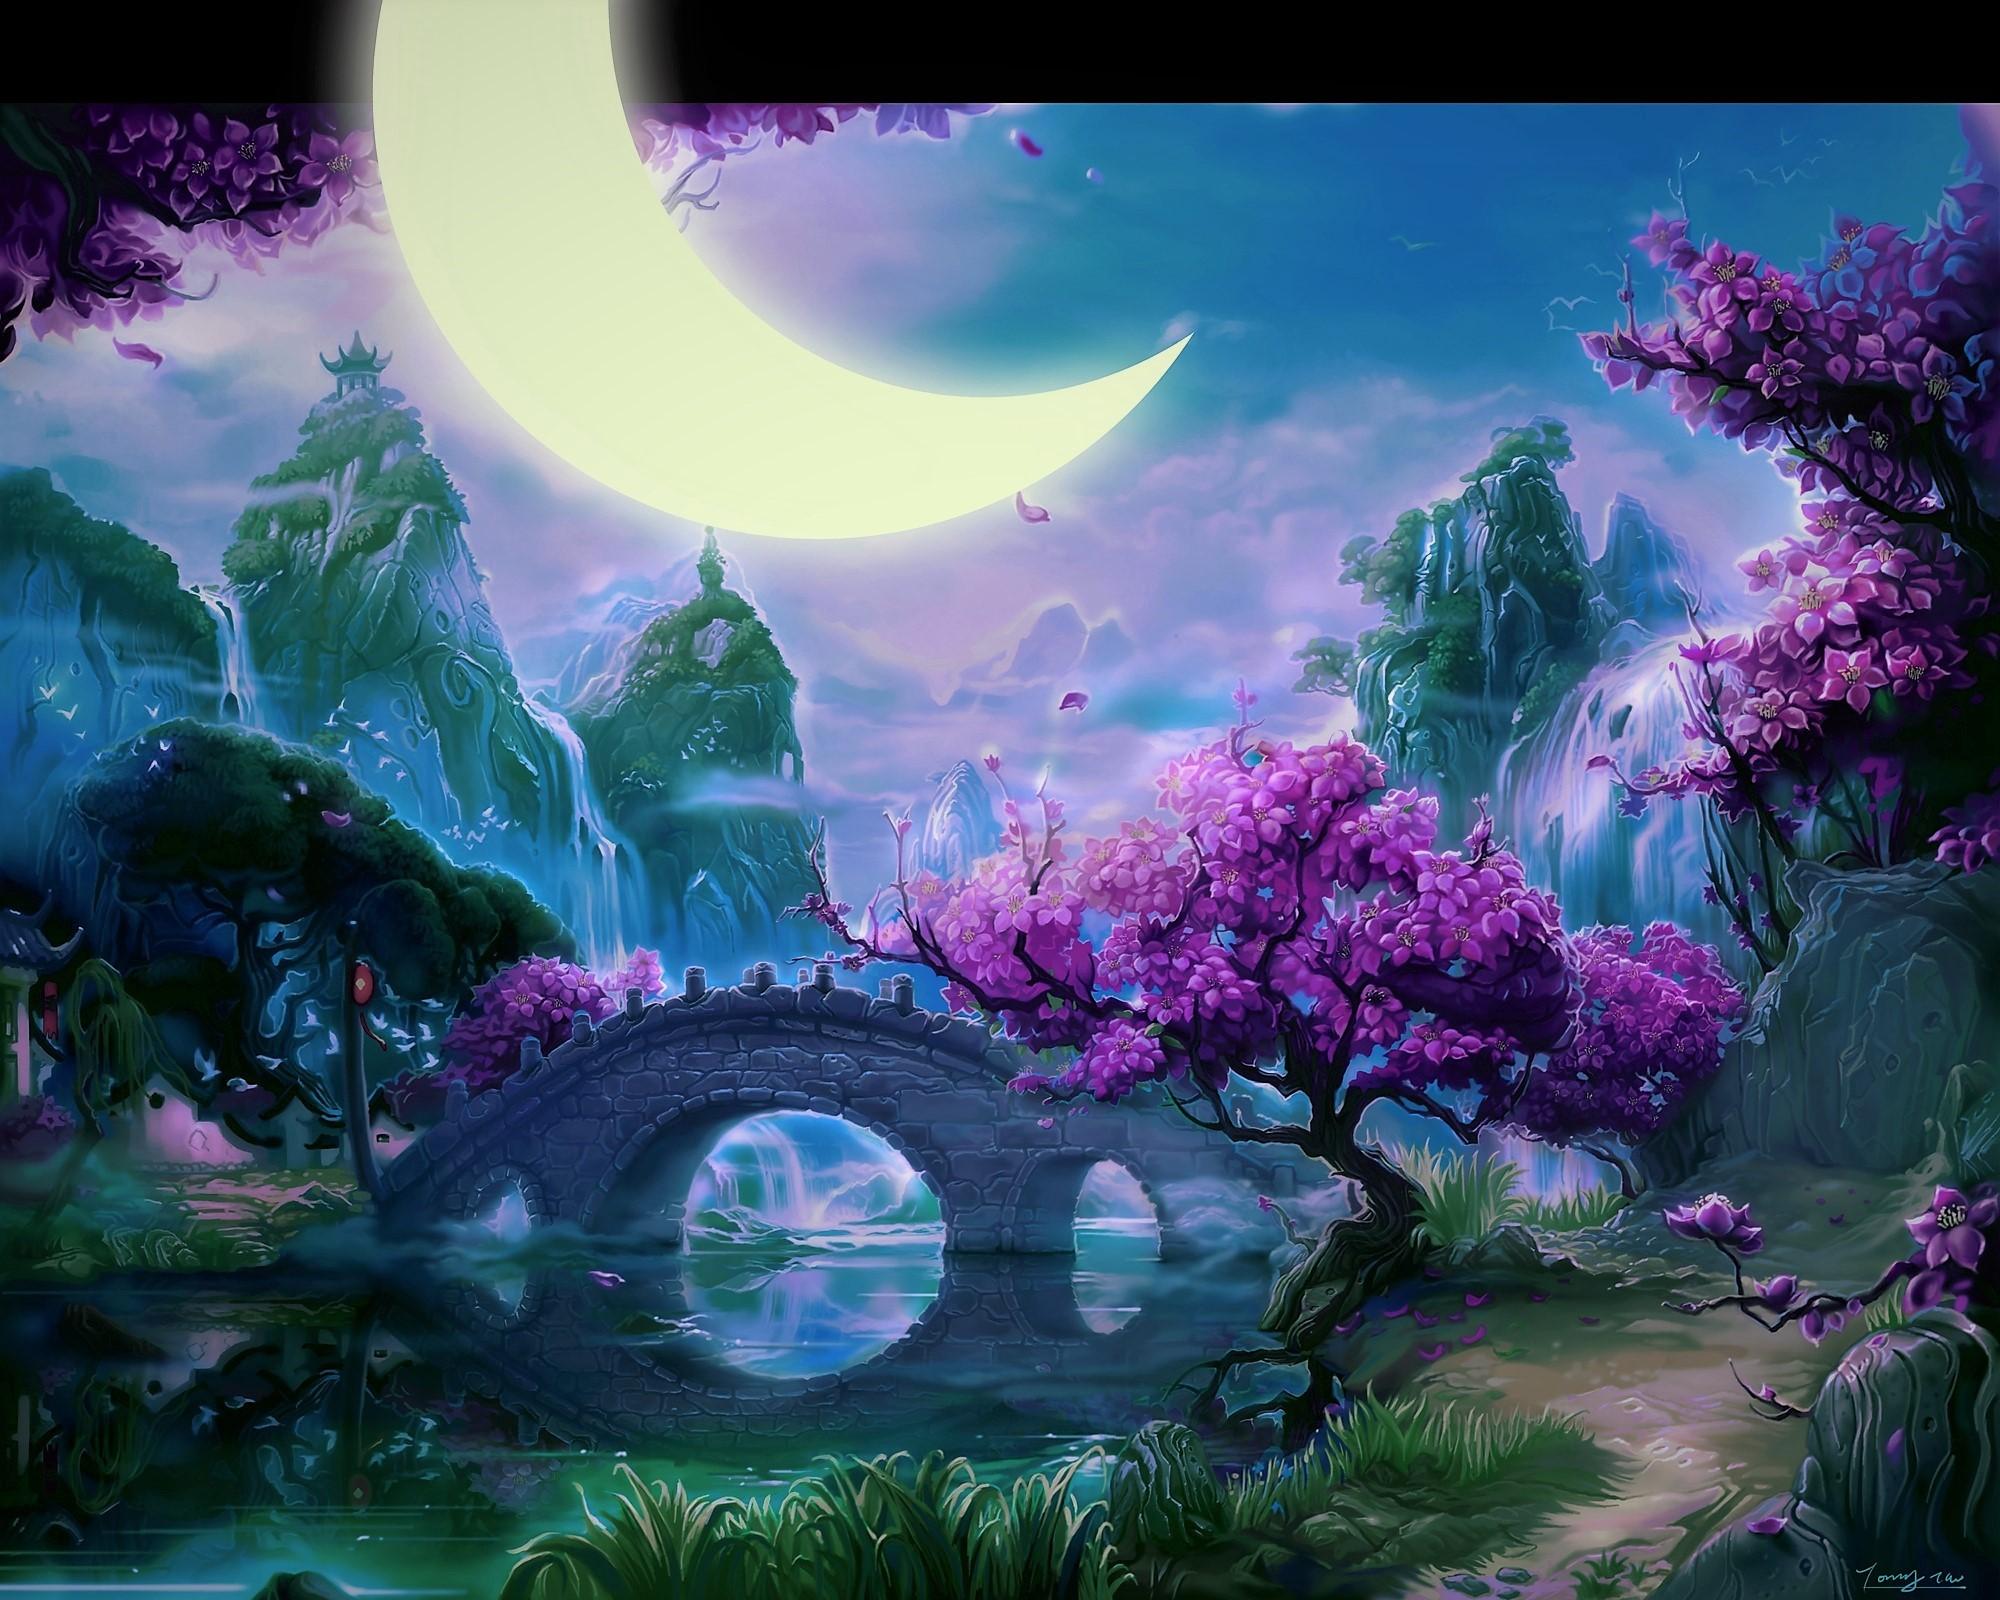 Fantasy landscape hd wallpaper background image - Fantasy wallpaper bridge ...